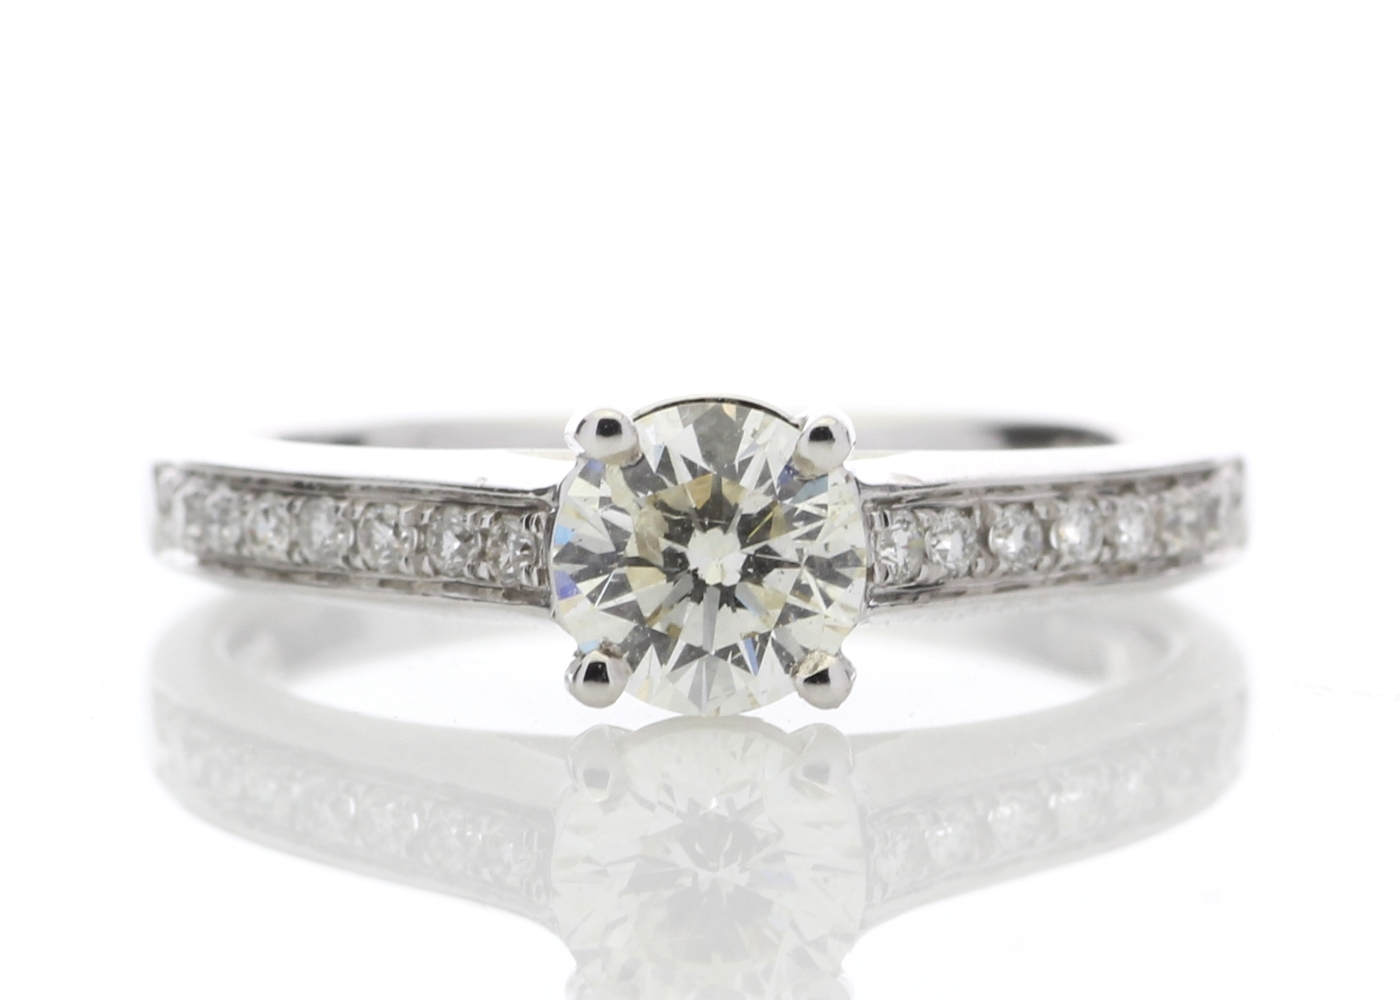 18ct White Gold Single Stone Claw Set Diamond Ring 0.73 Carats